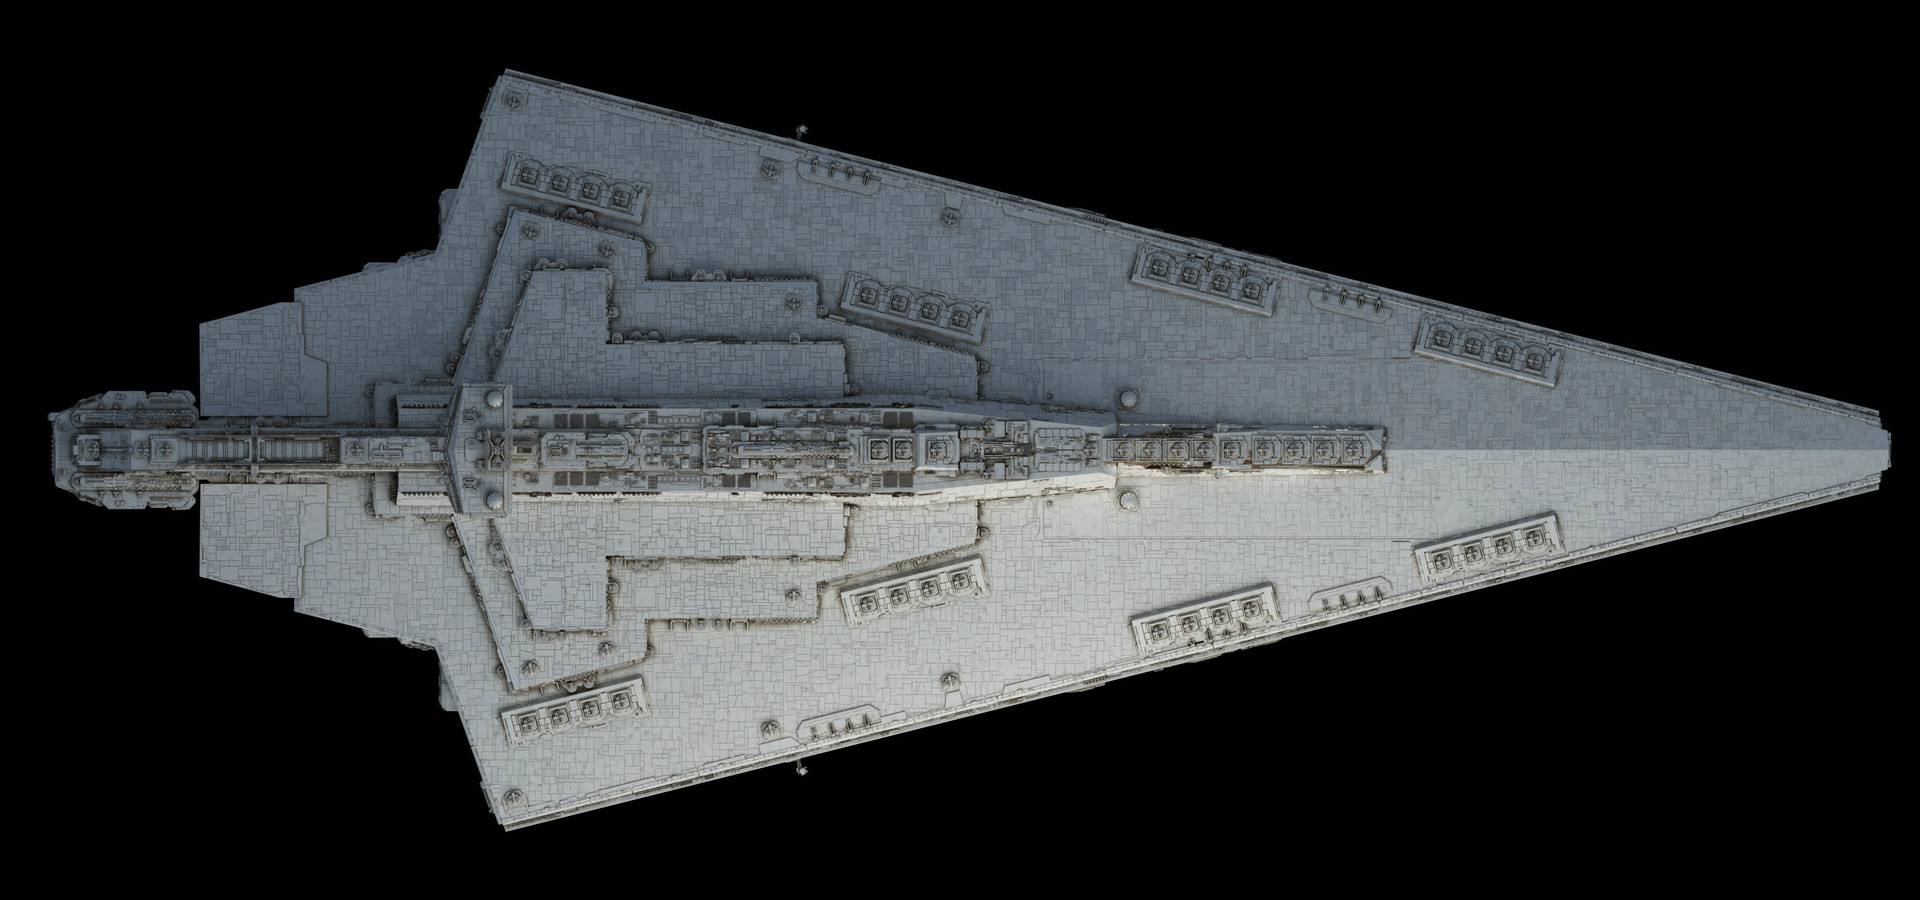 Ansel hsiao cruiser21